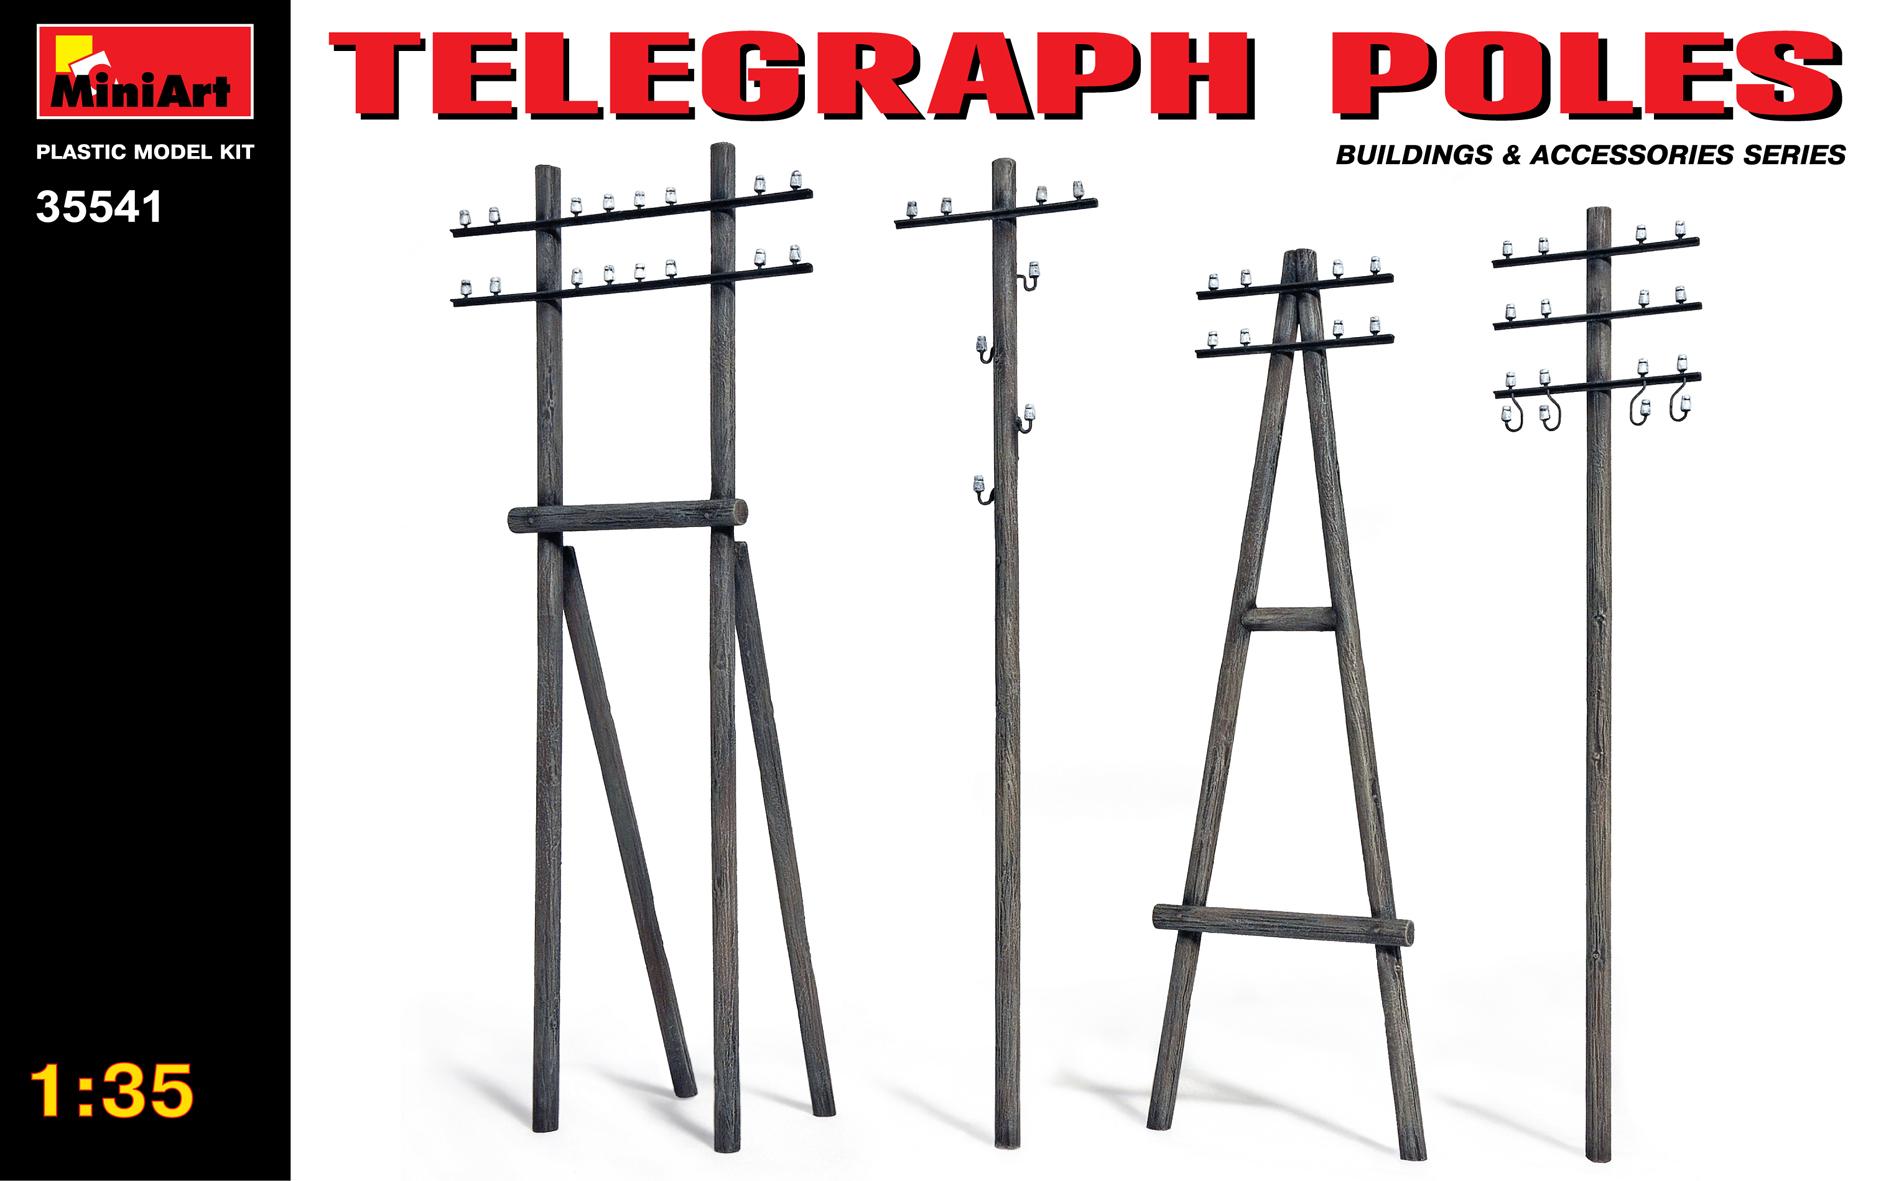 35541 TELEGRAPH POLES